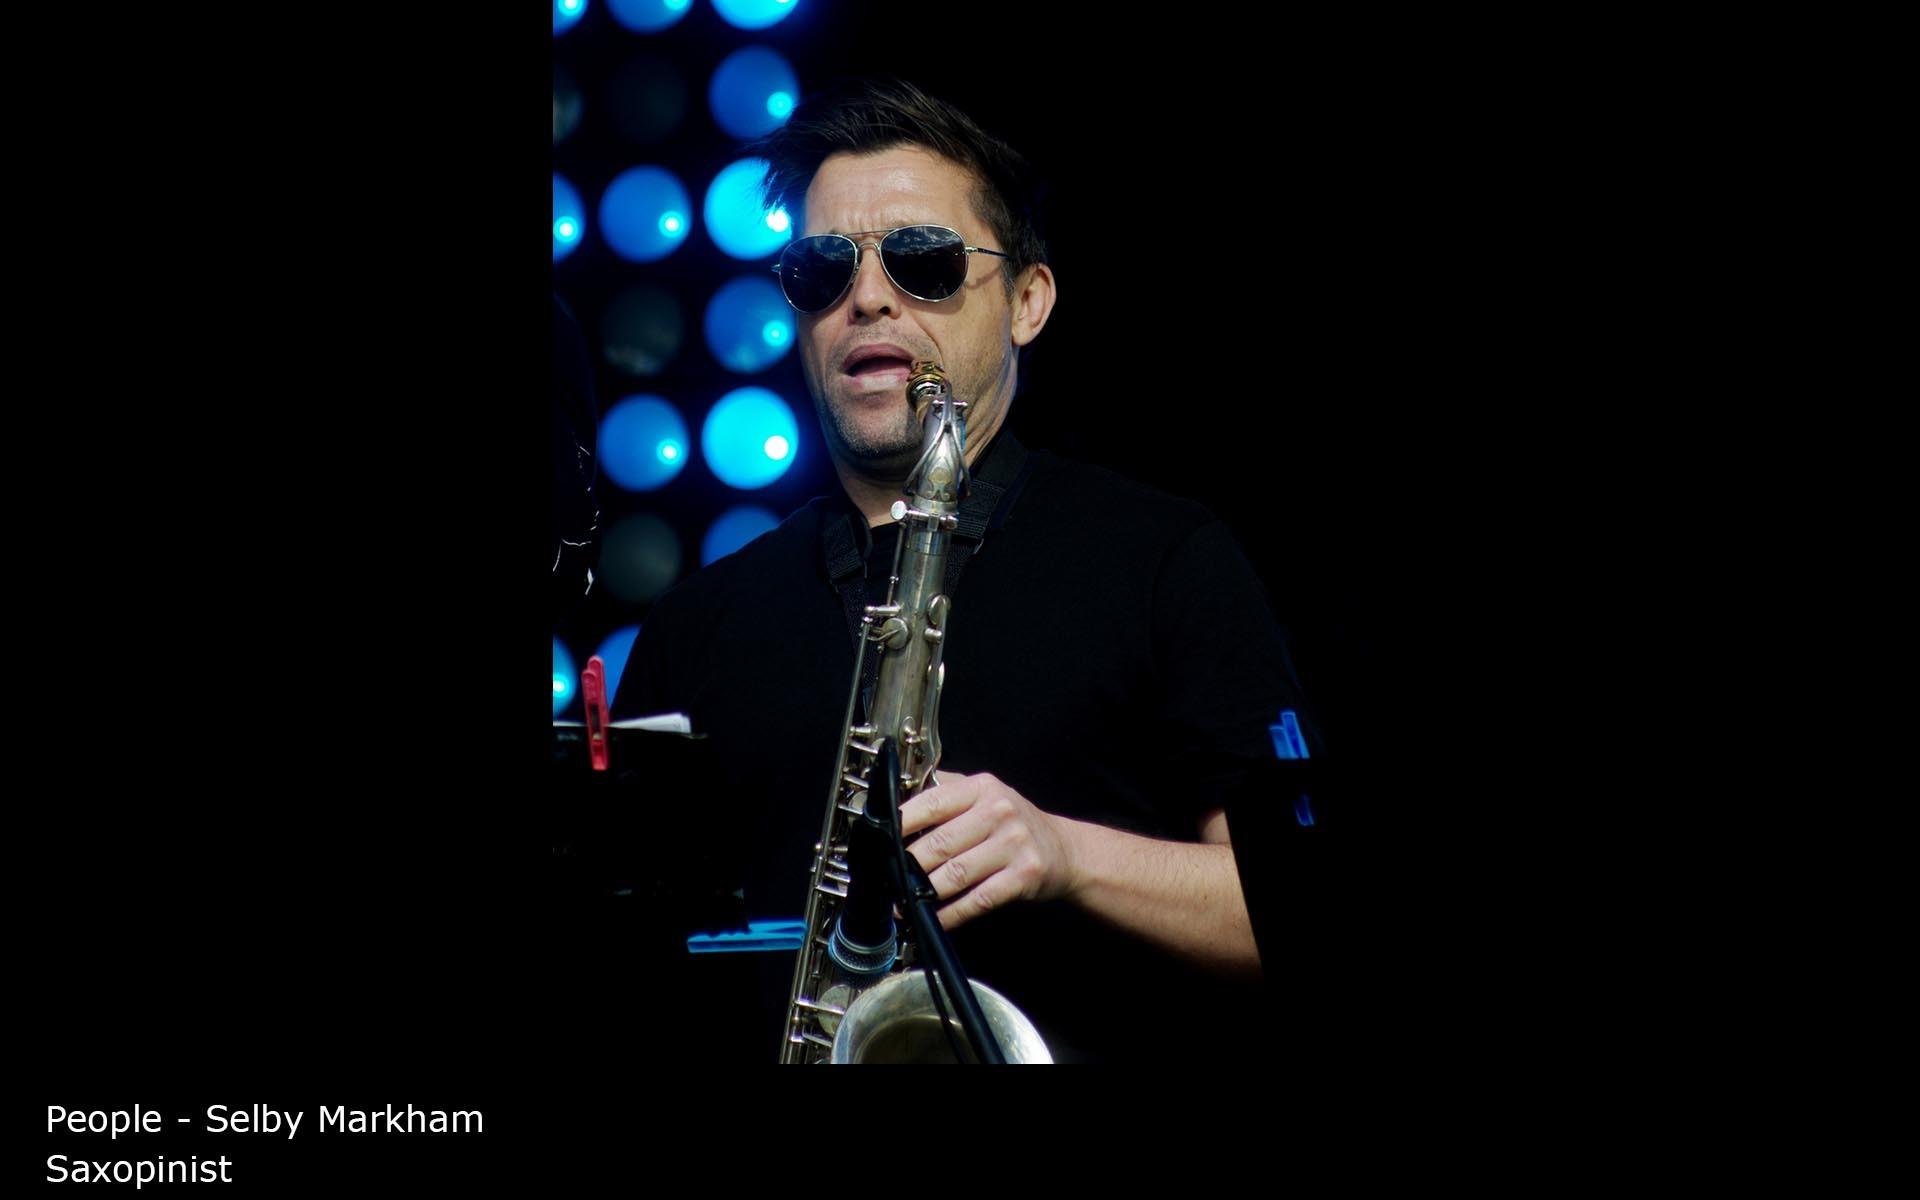 Saxopinist - Selby Markham